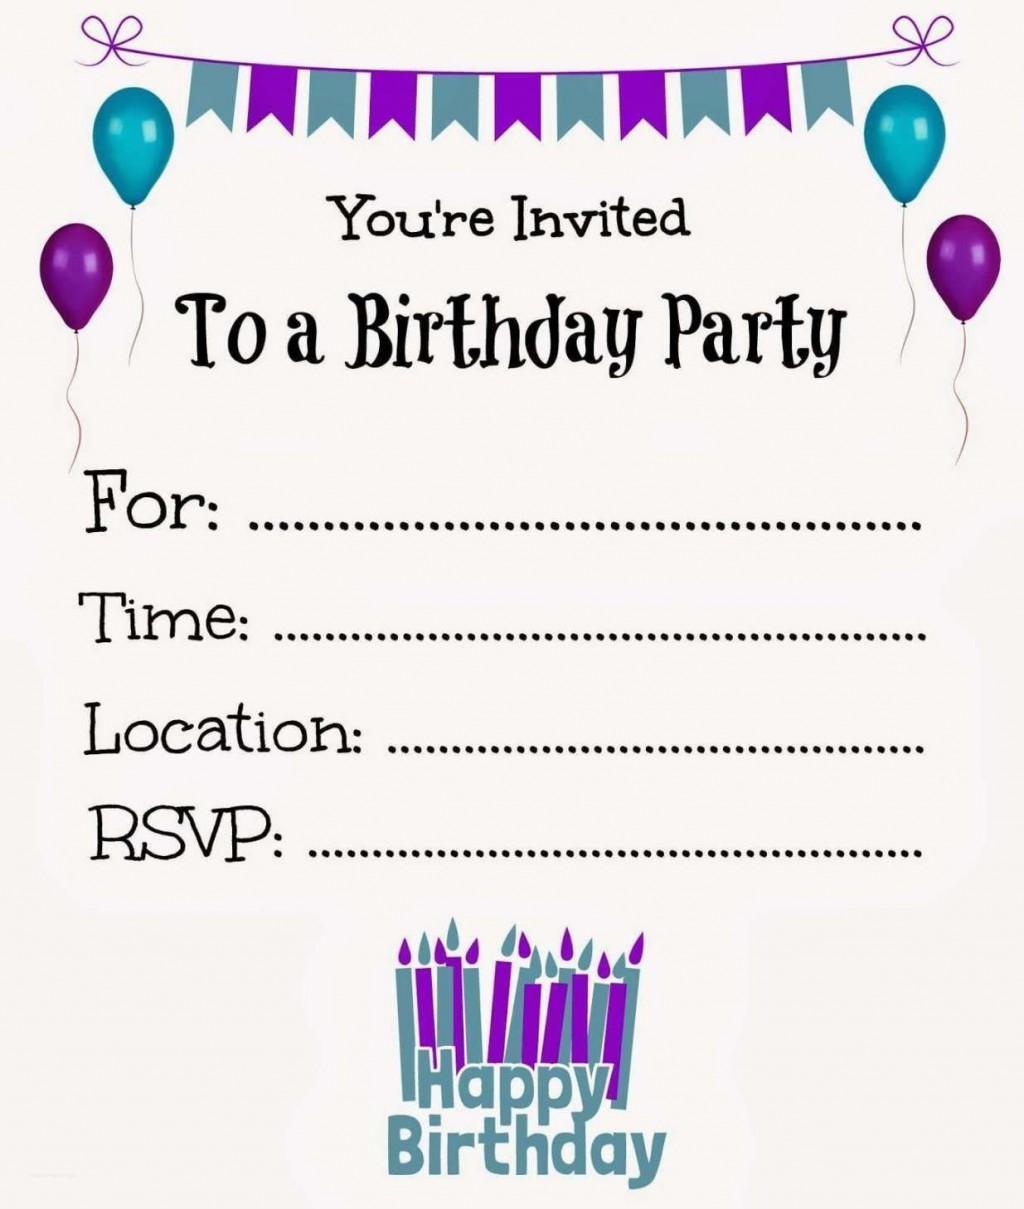 005 Amazing Free Online Printable Birthday Invitation Template Inspiration  Templates Card MakerLarge